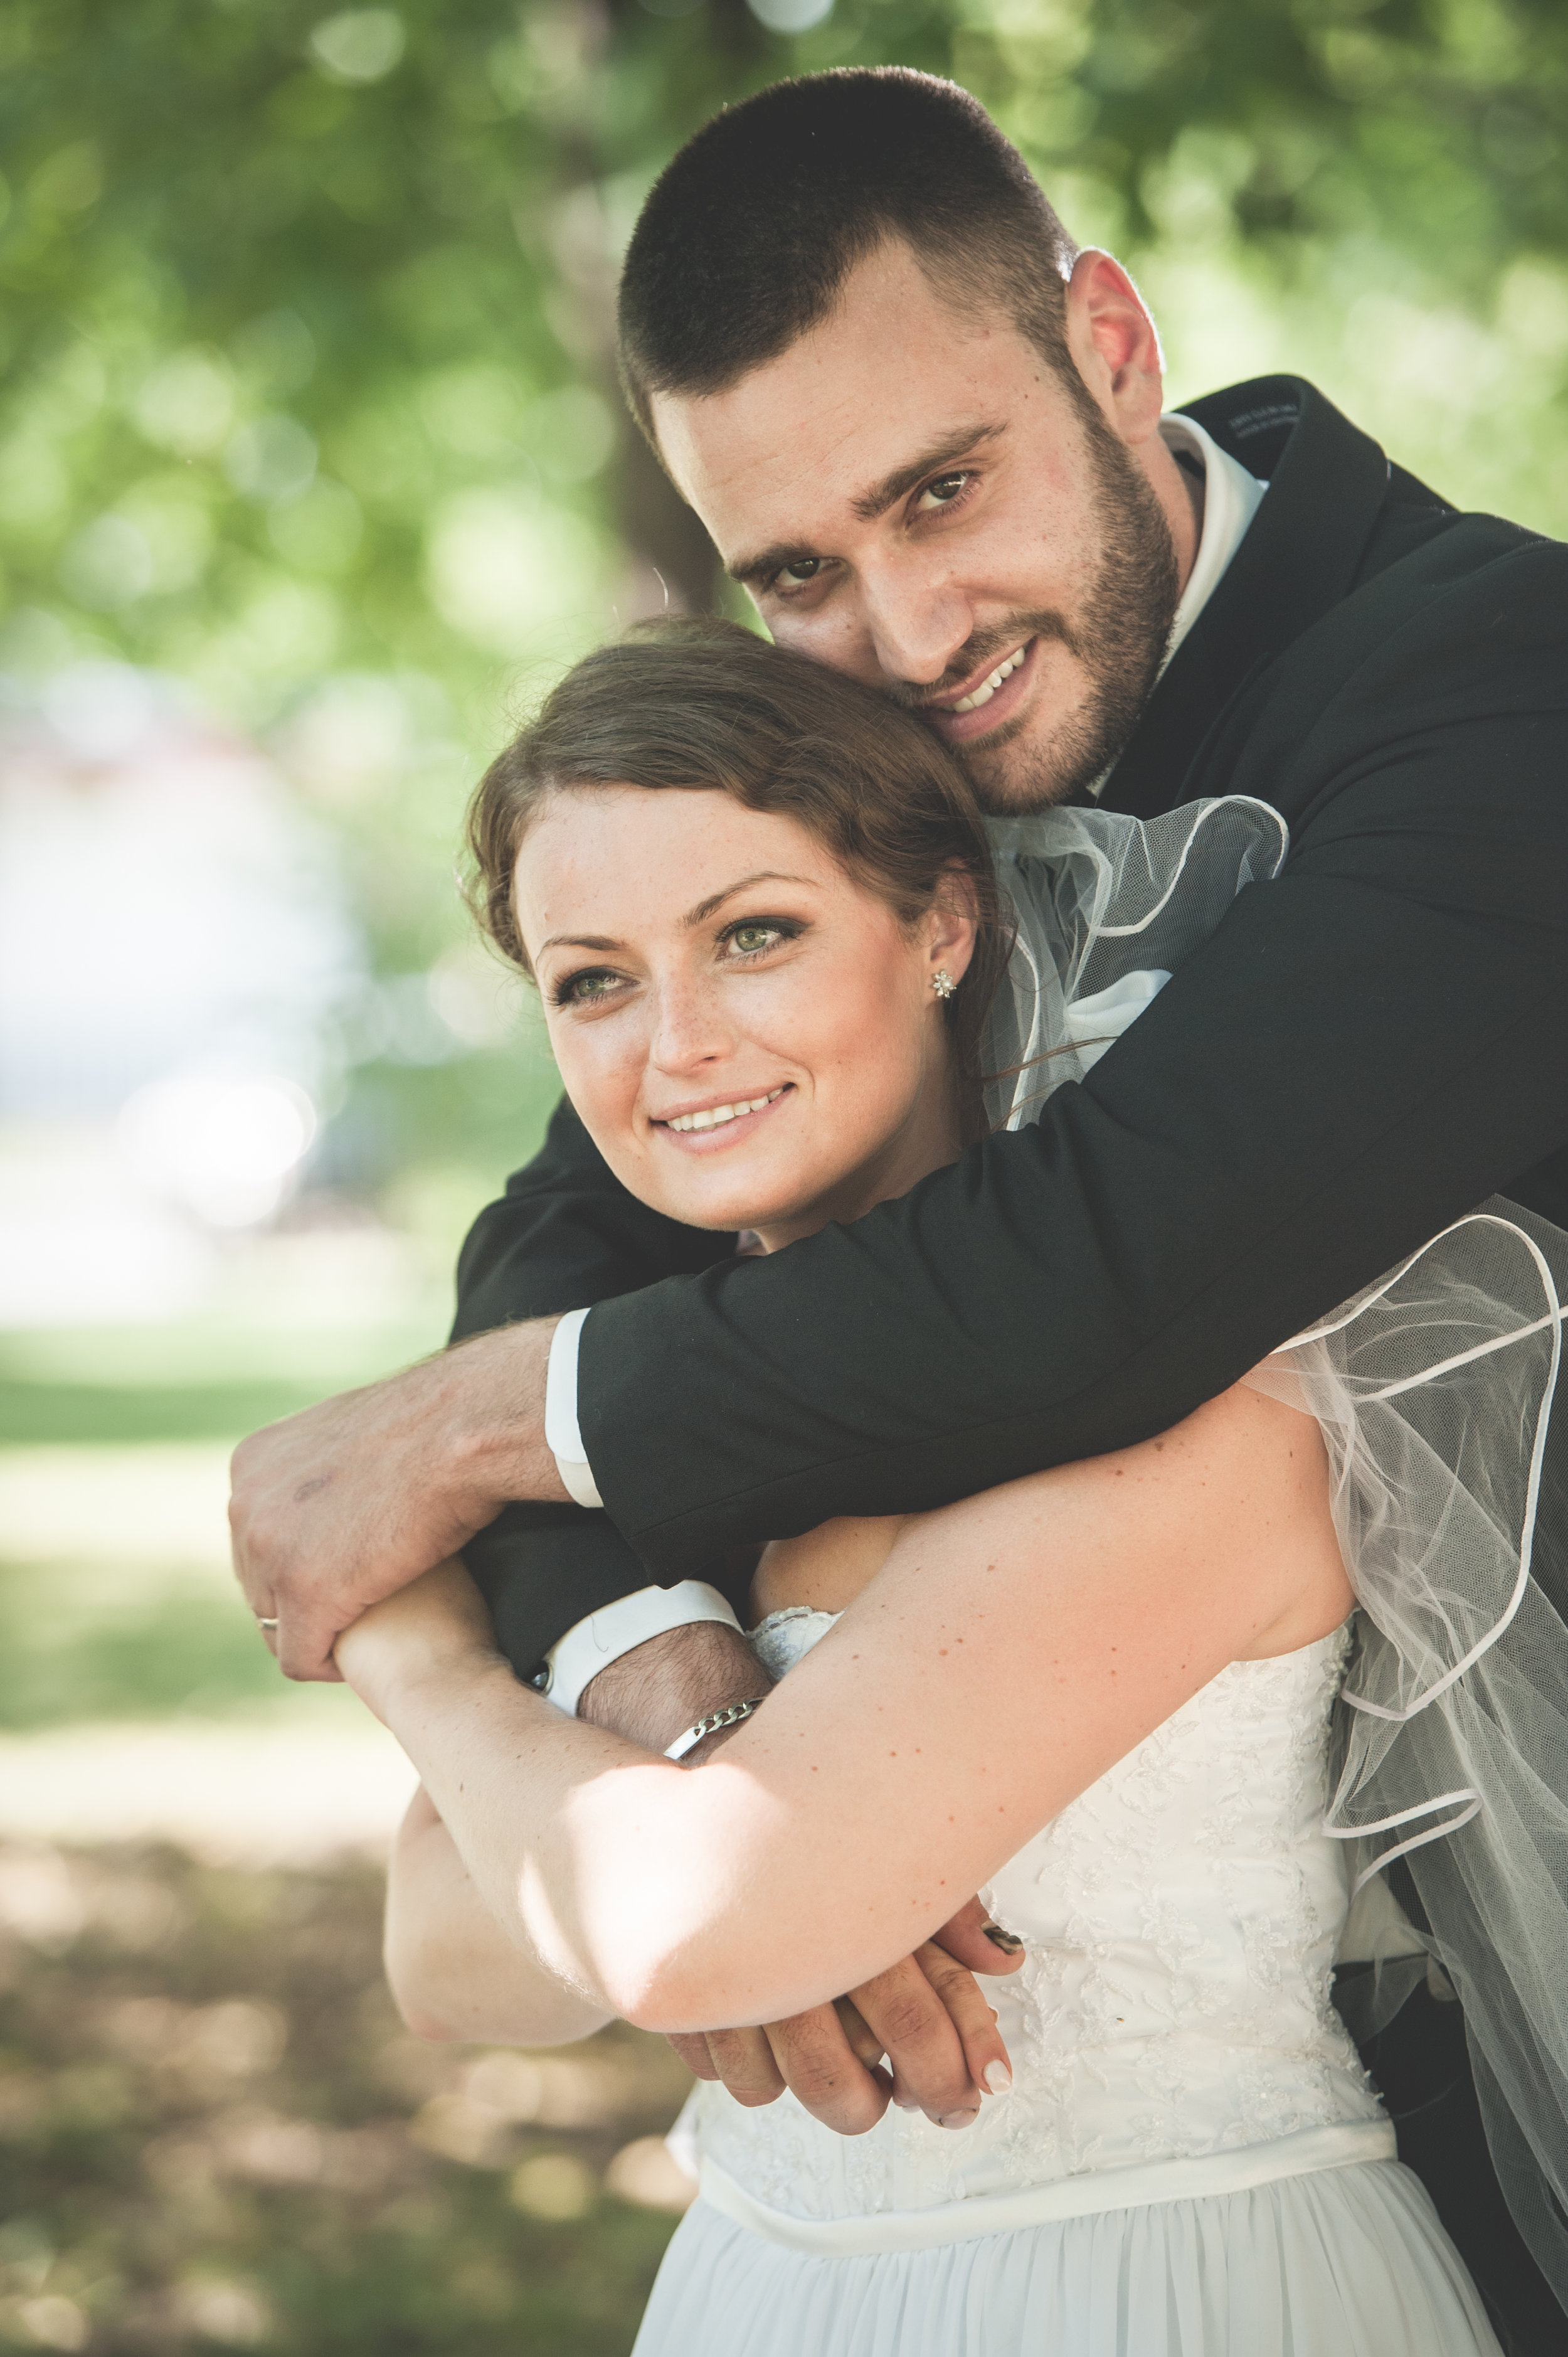 Marriage_Dom&Eli_2015_renrob©-101.jpg